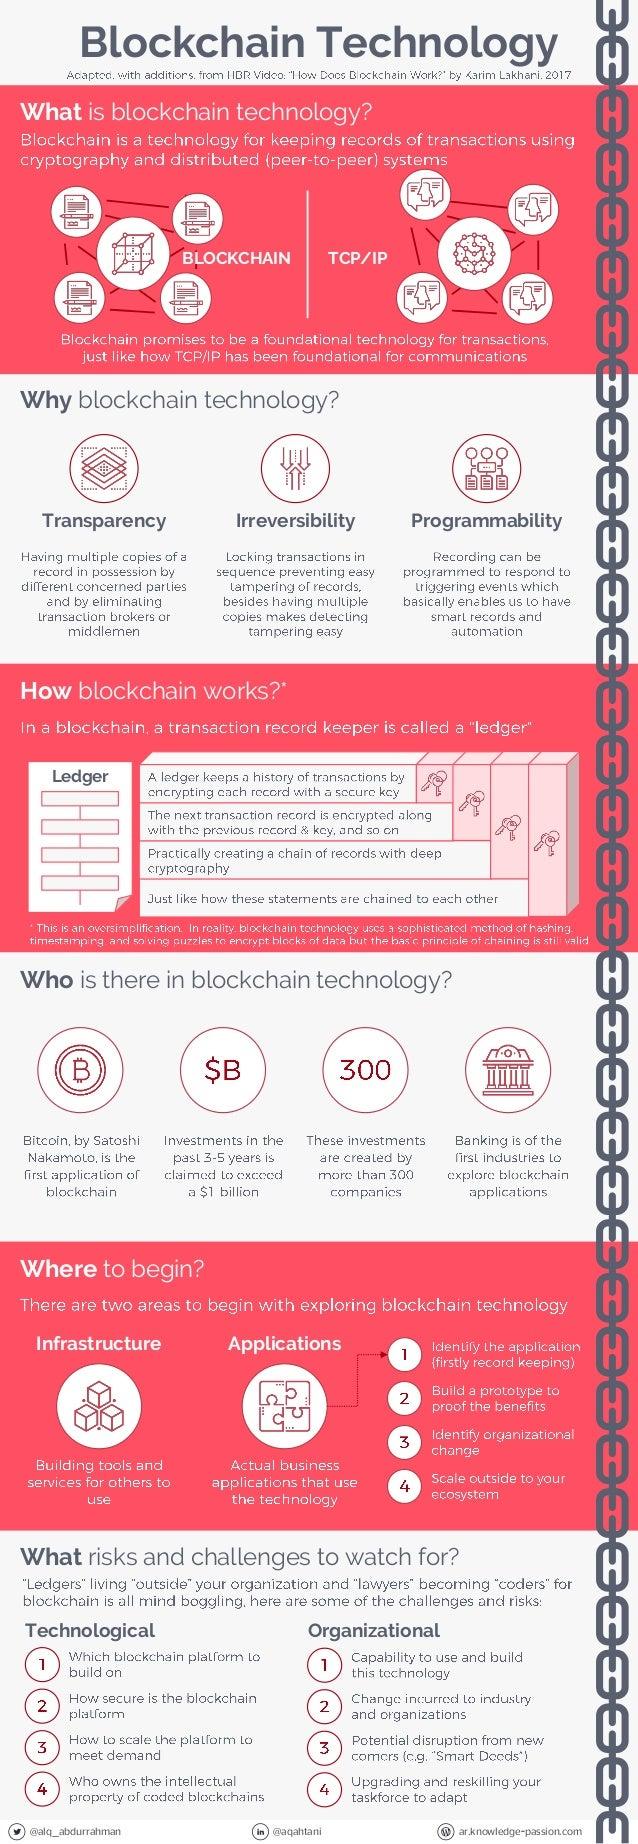 @alq_abdurrahman @aqahtani ar.knowledge-passion.com What is blockchain technology? Blockchain Technology IrreversibilityTr...